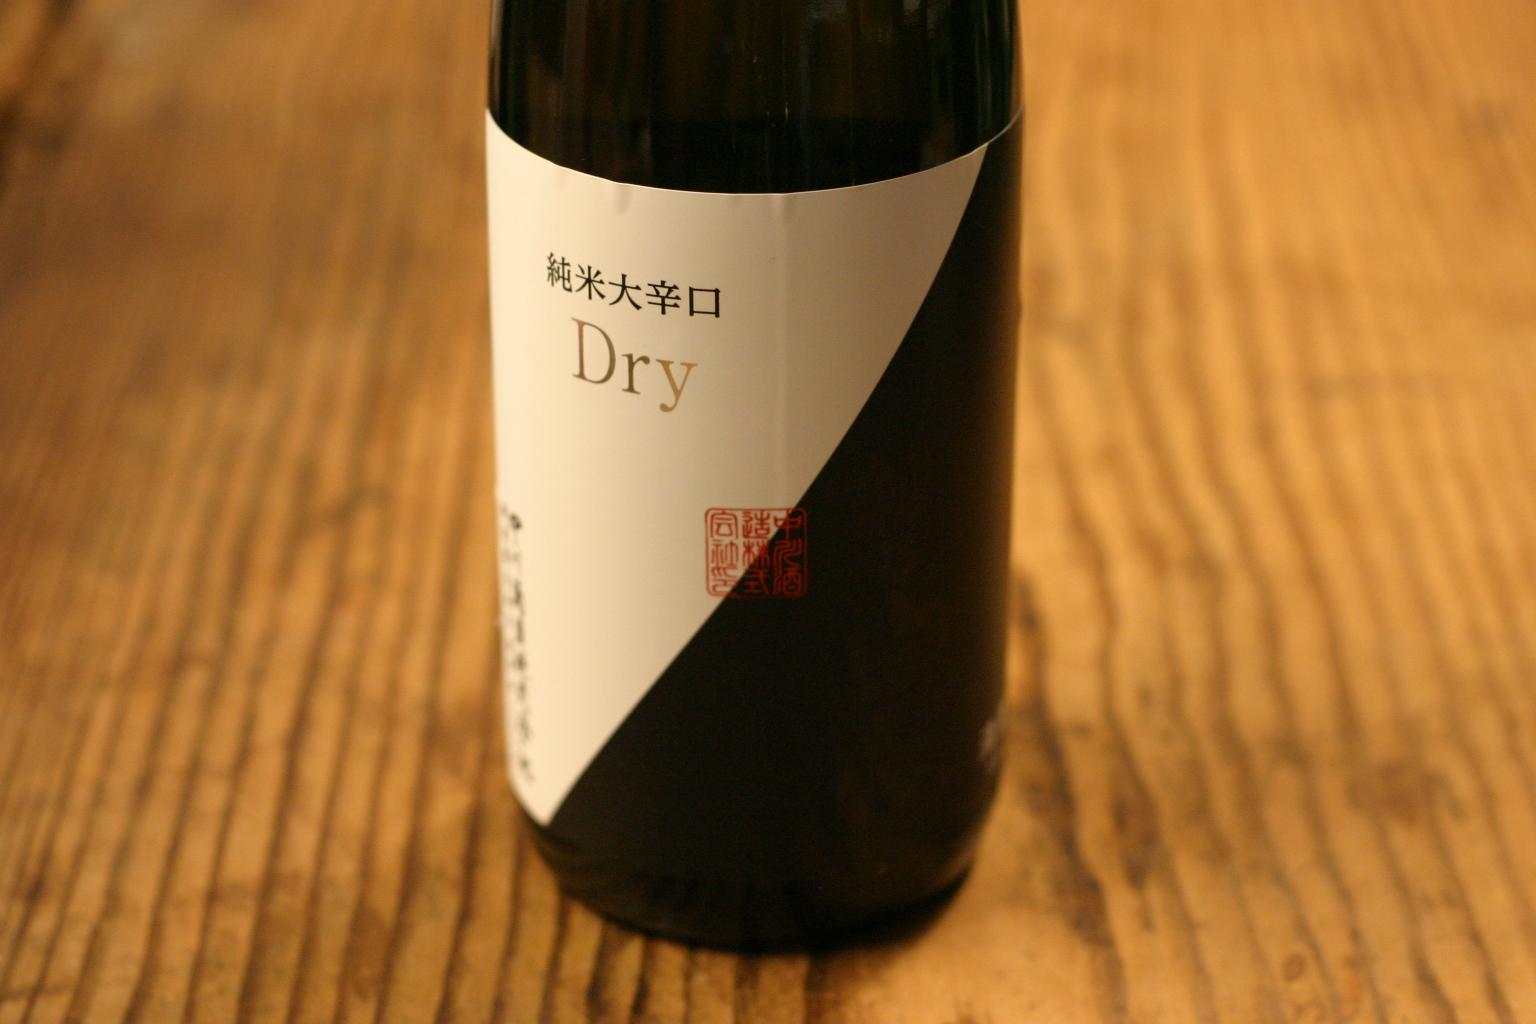 中川酒造 新色追加して再販 越乃白雁 純米大辛口 720ml Dry 記念日